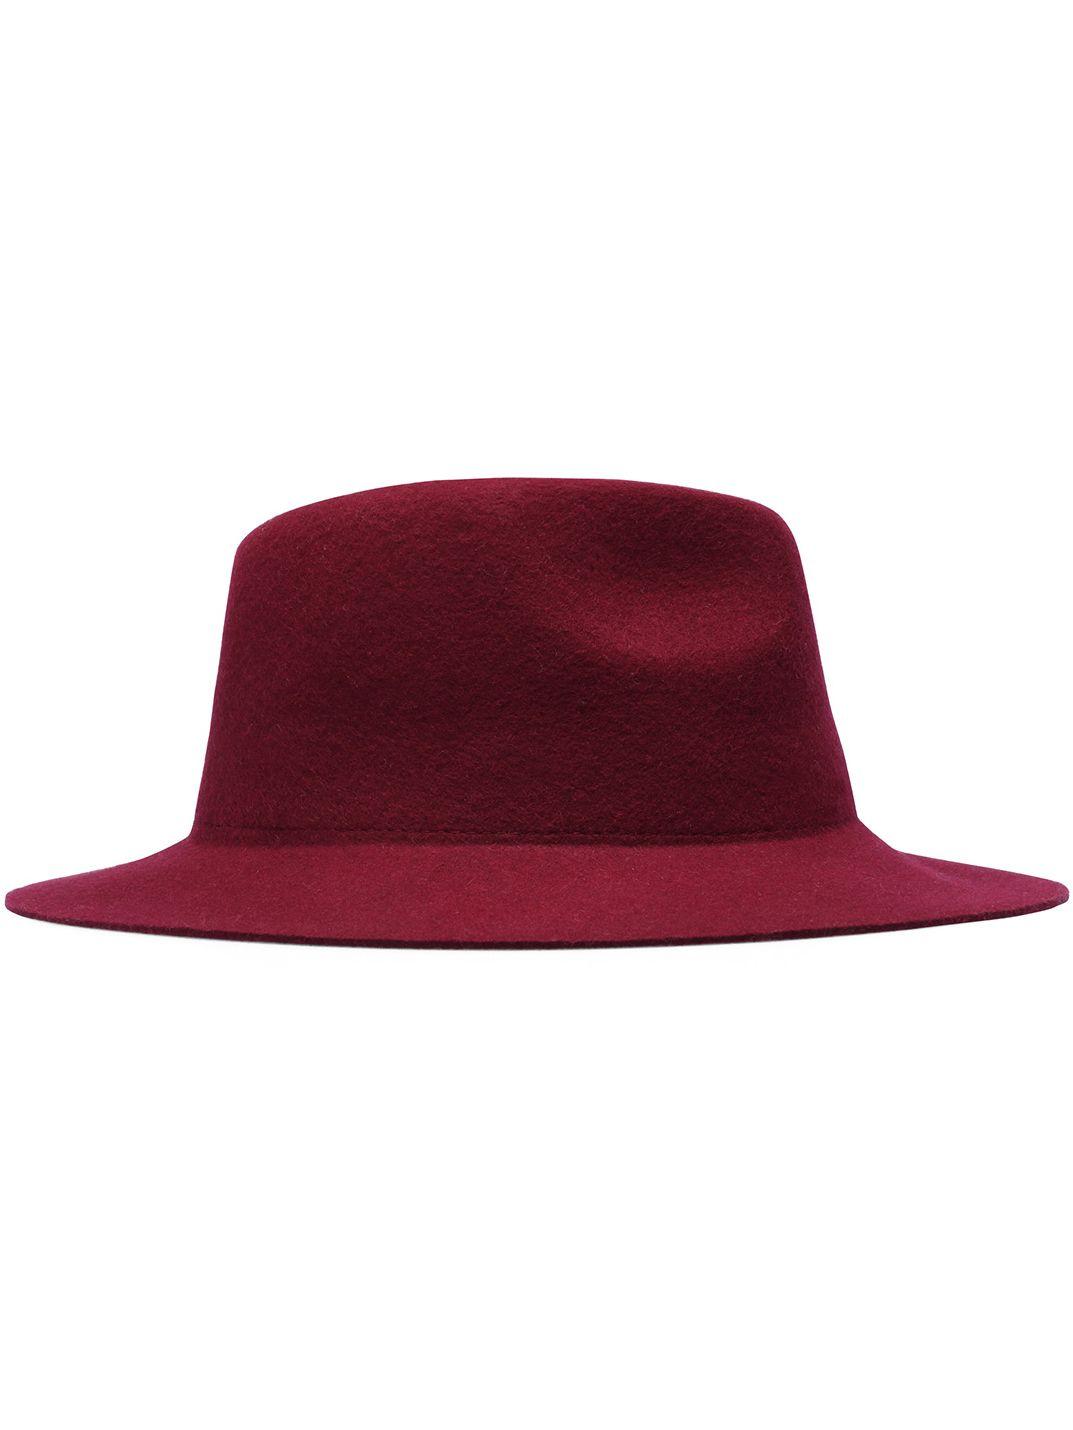 9783cbe761104 Sombrero casual redondo-(Sheinside)